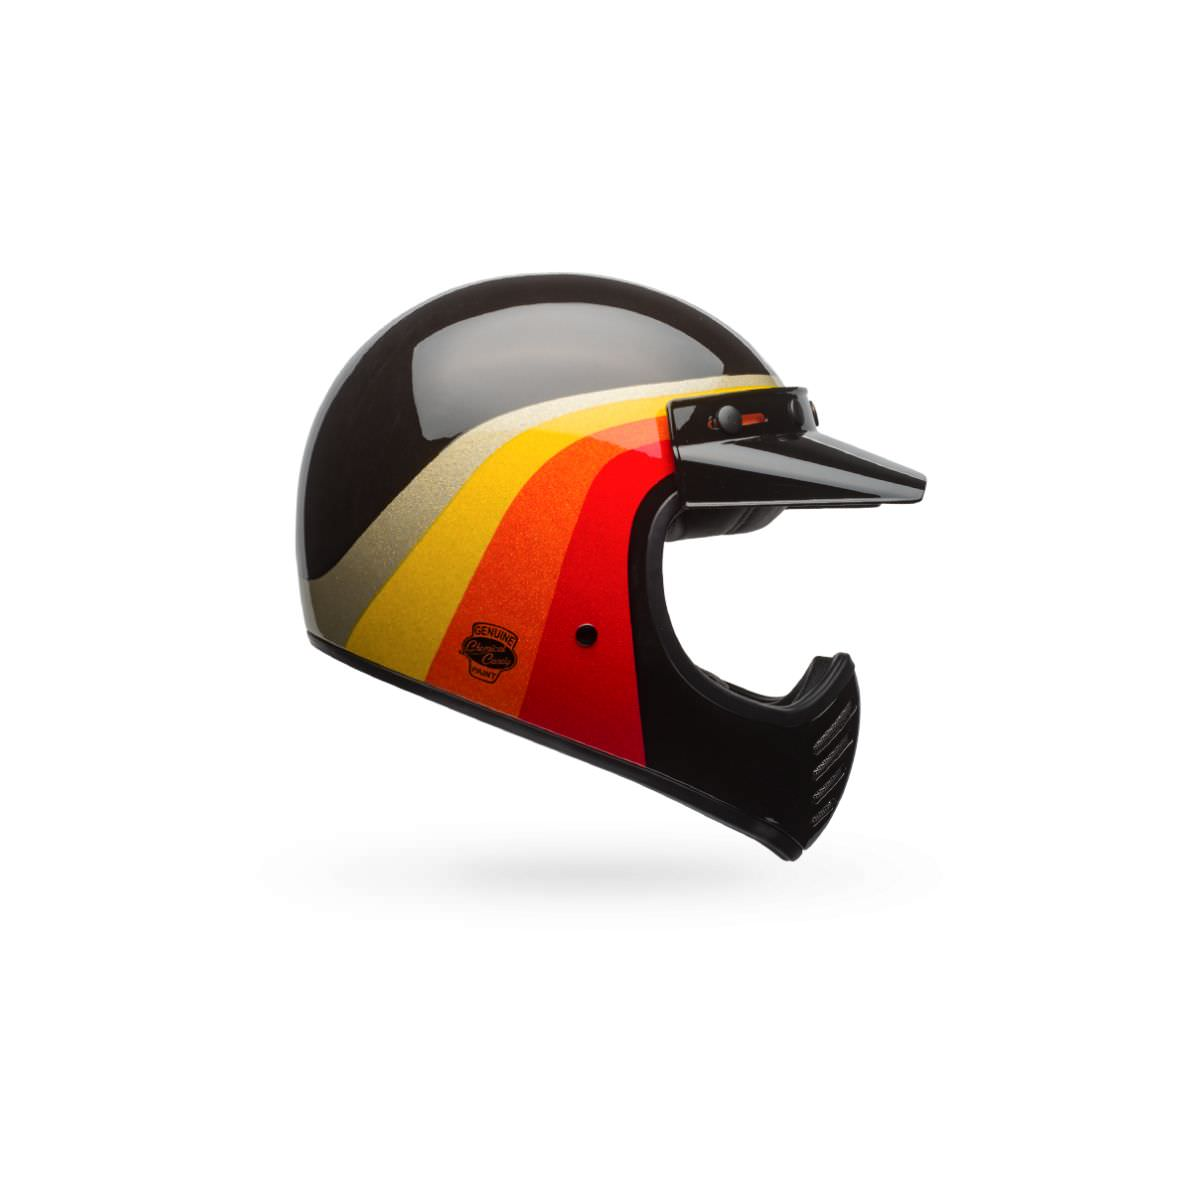 Bell Moto 3 Chemical Candy Helmet 3 - Bell Moto-3 Chemical Candy Helmet